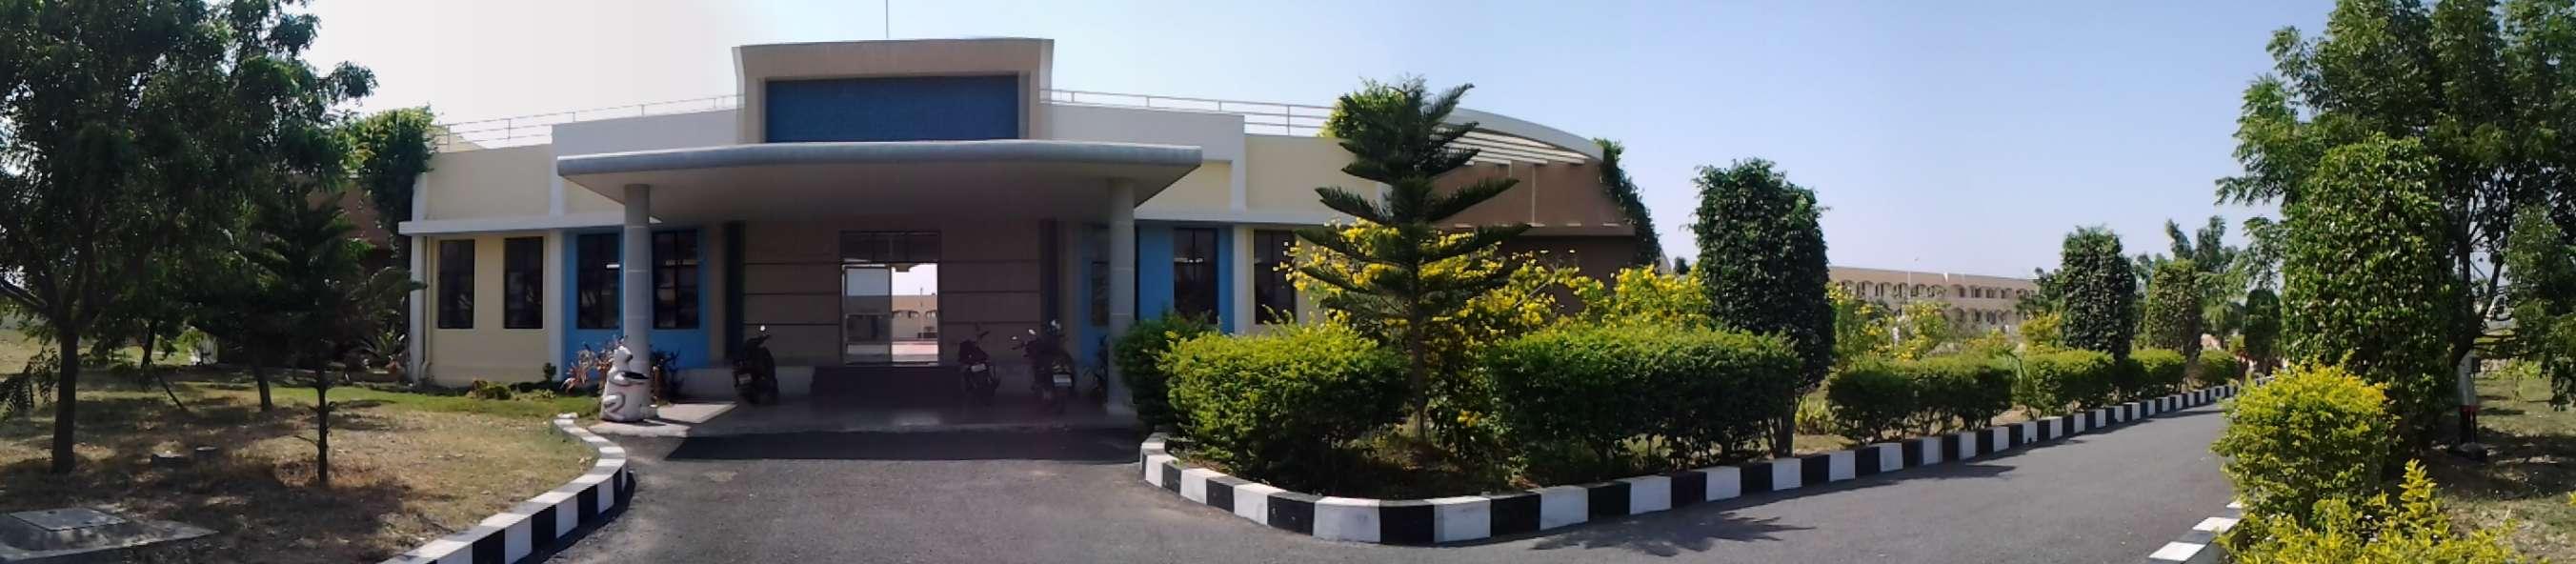 RAMANATH SECONDARY SCHOOL NSTL COMPLEX VIGYAN NAGAR VISAKHAPATNAM ANDHRA PRADESH 130091